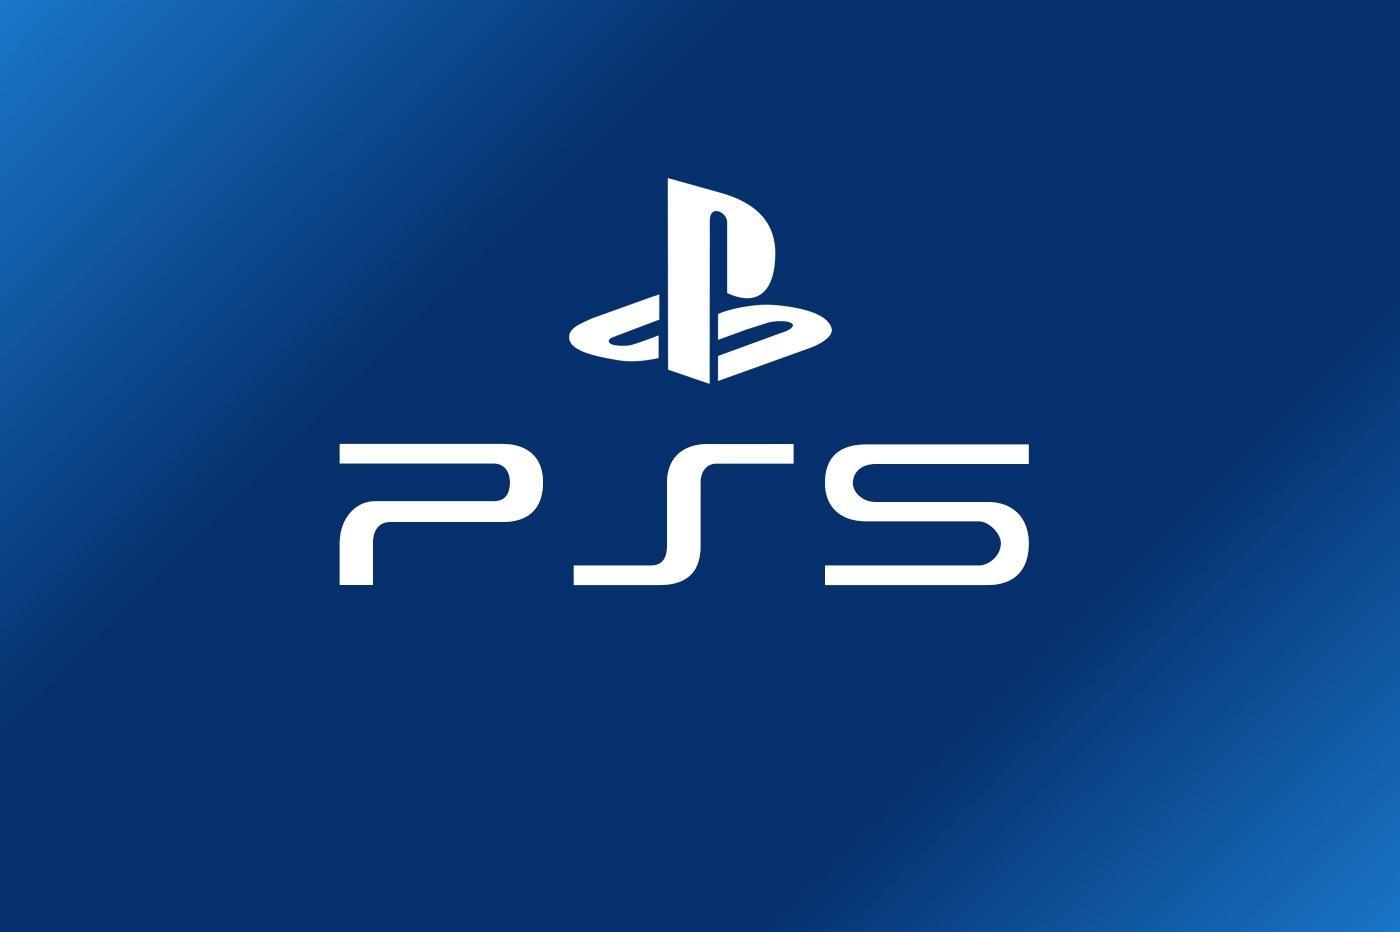 PS5游戏盘放到PS4里会怎样?这样做的玩家悲剧了